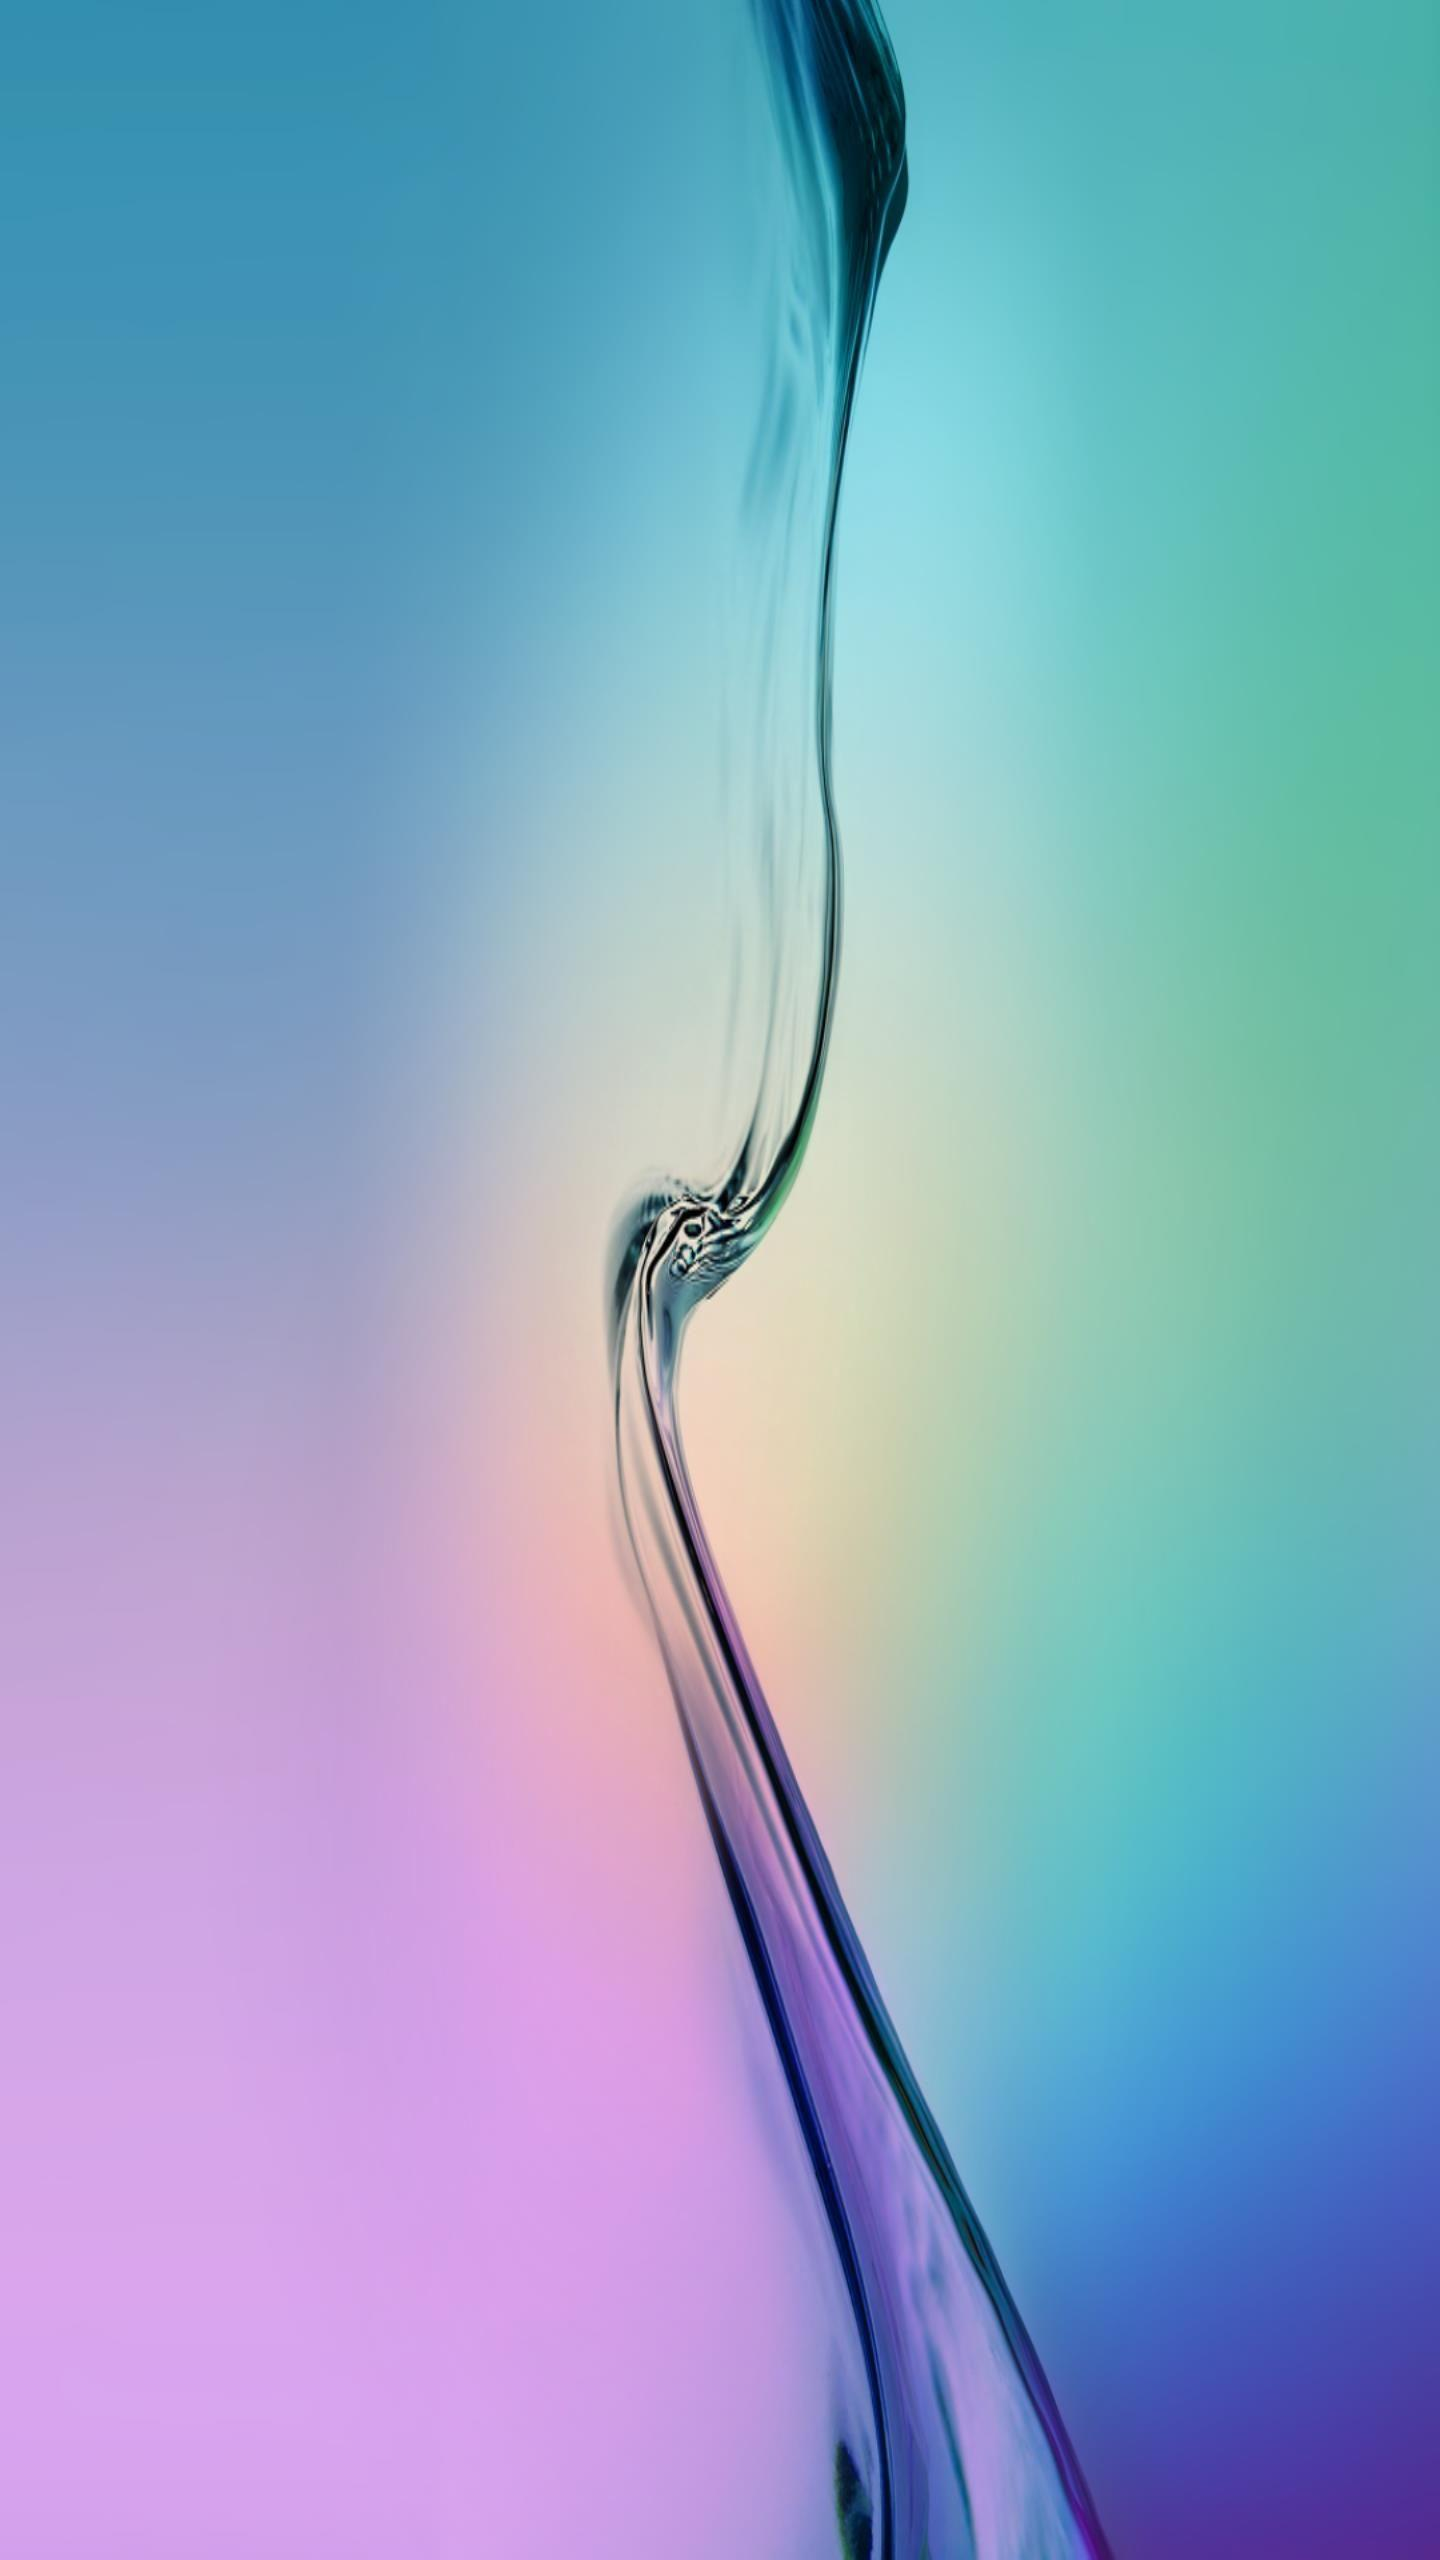 Galaxy S6 Wallpaper HD - WallpaperSafari